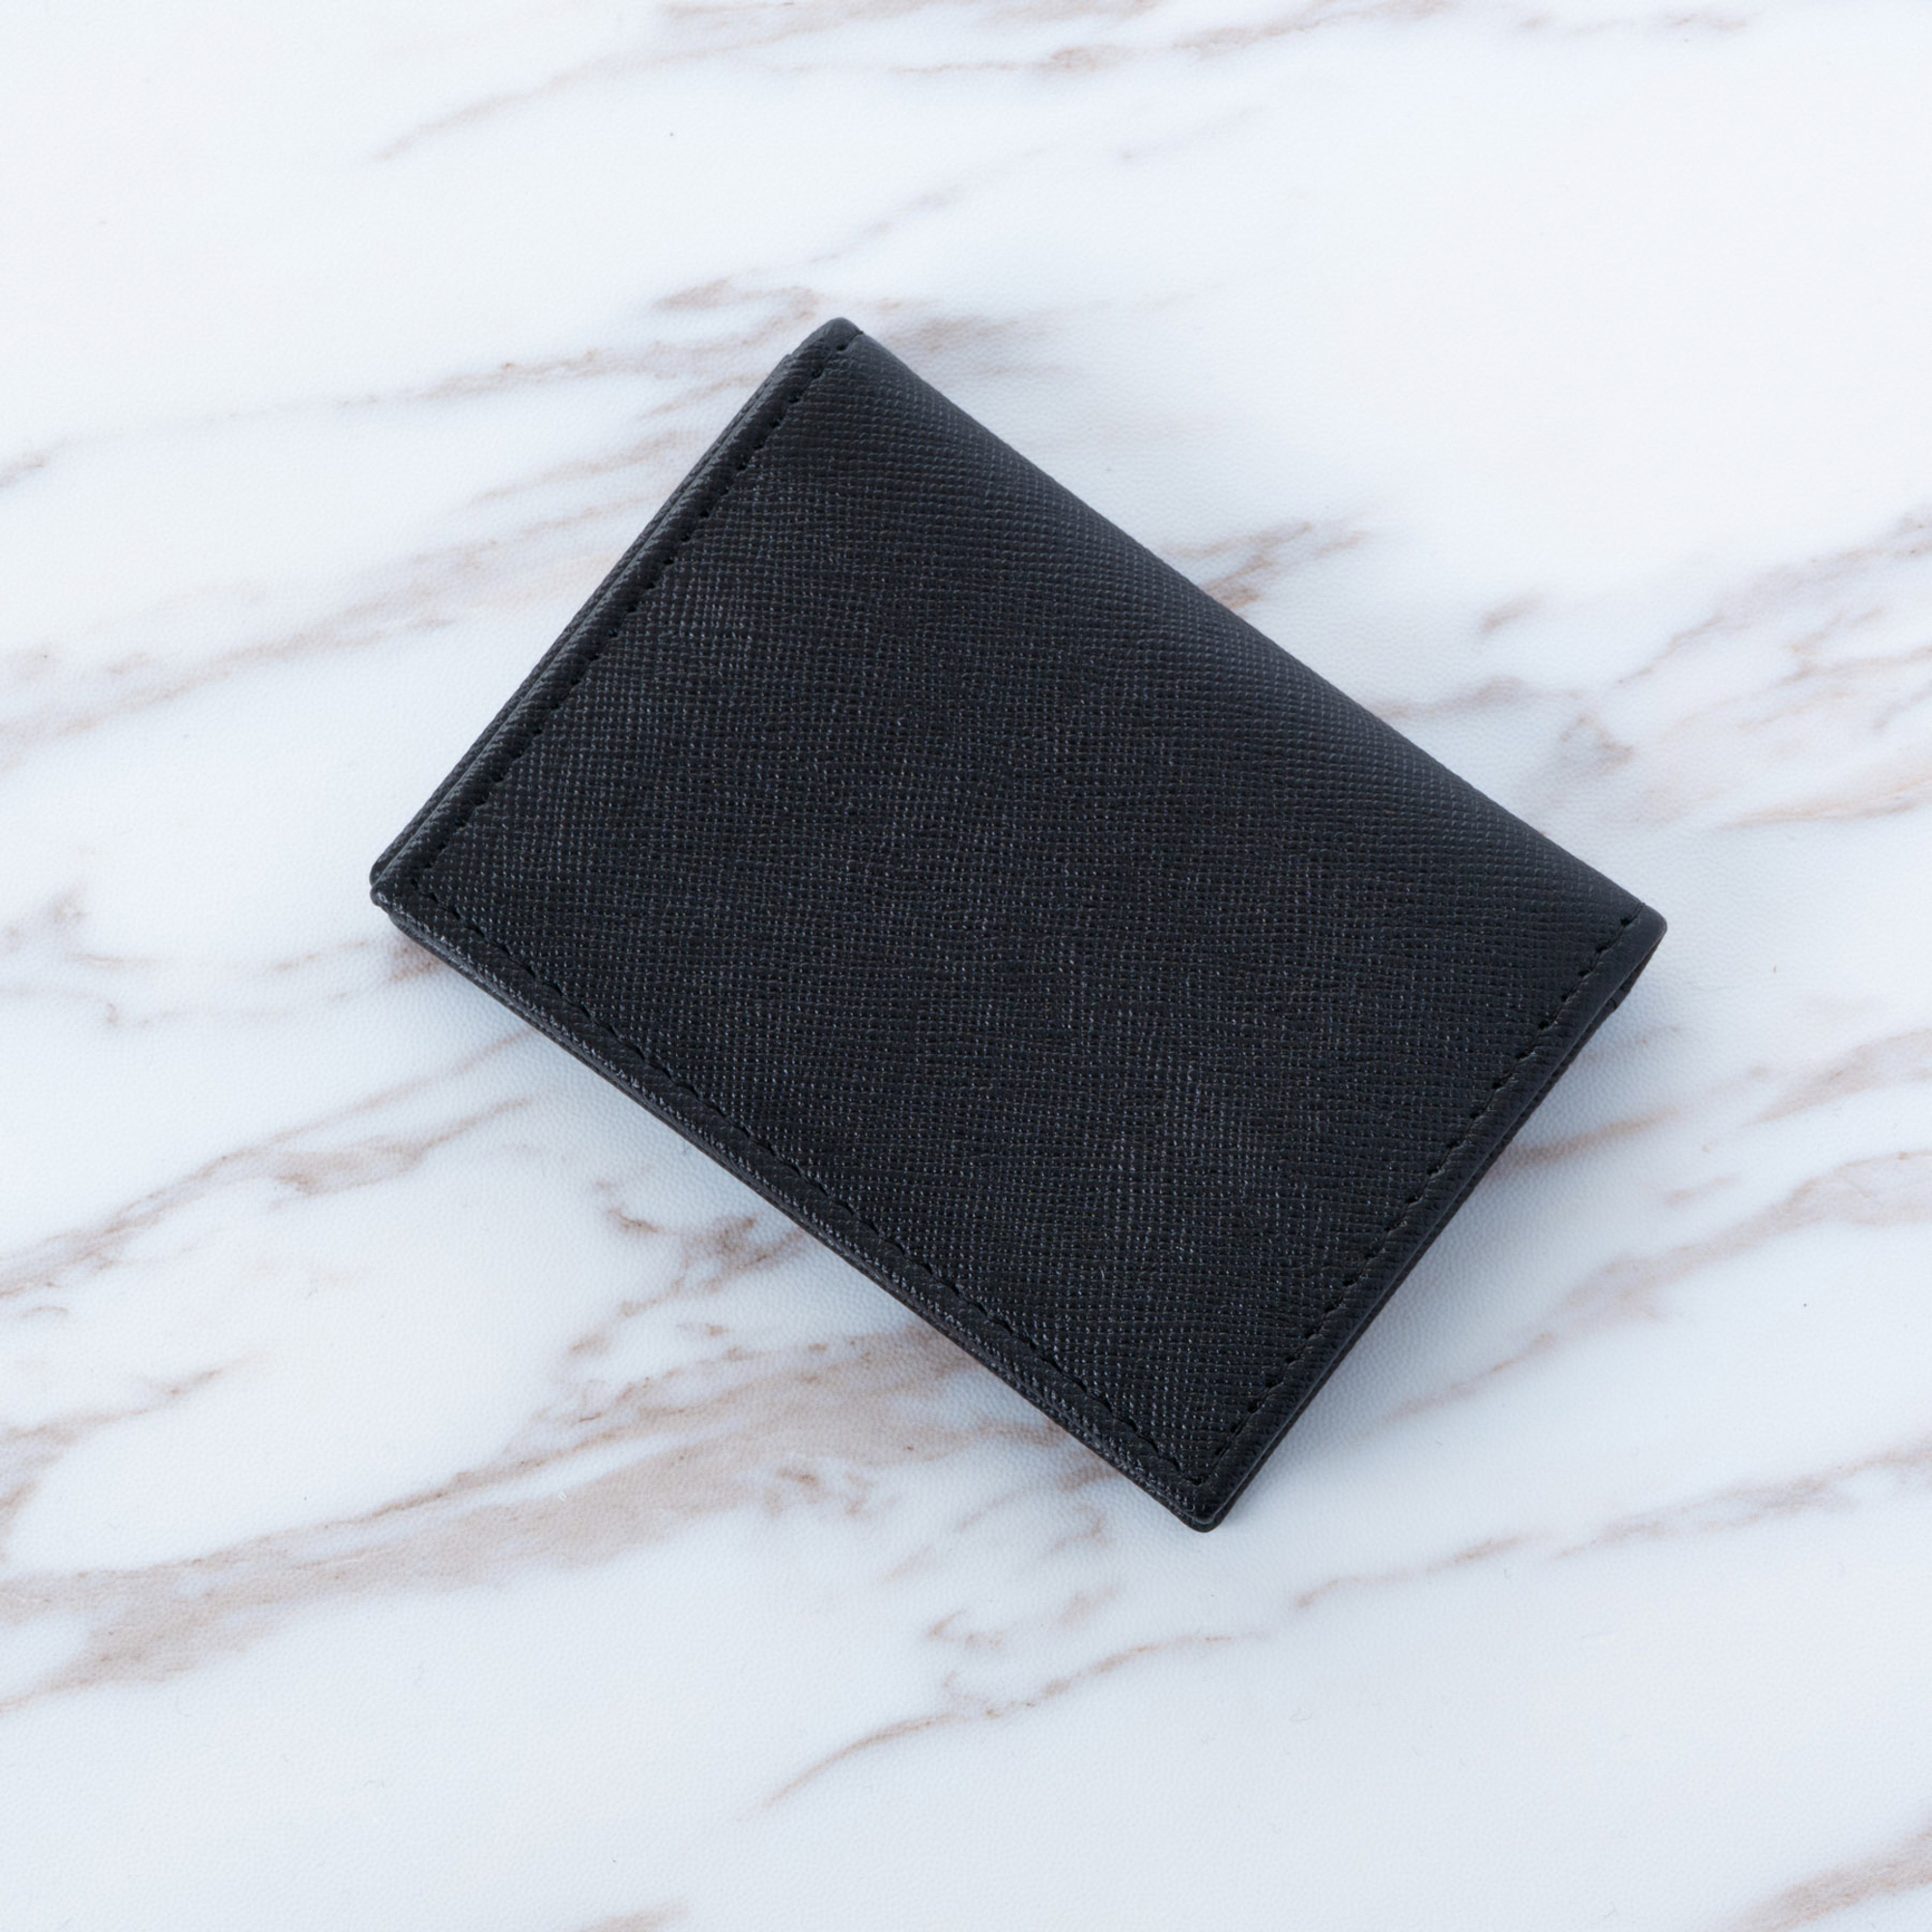 Alpine-Swiss-RFID-Leather-Business-Card-Wallet-Minimalist-ID-Window-Card-Holder thumbnail 37